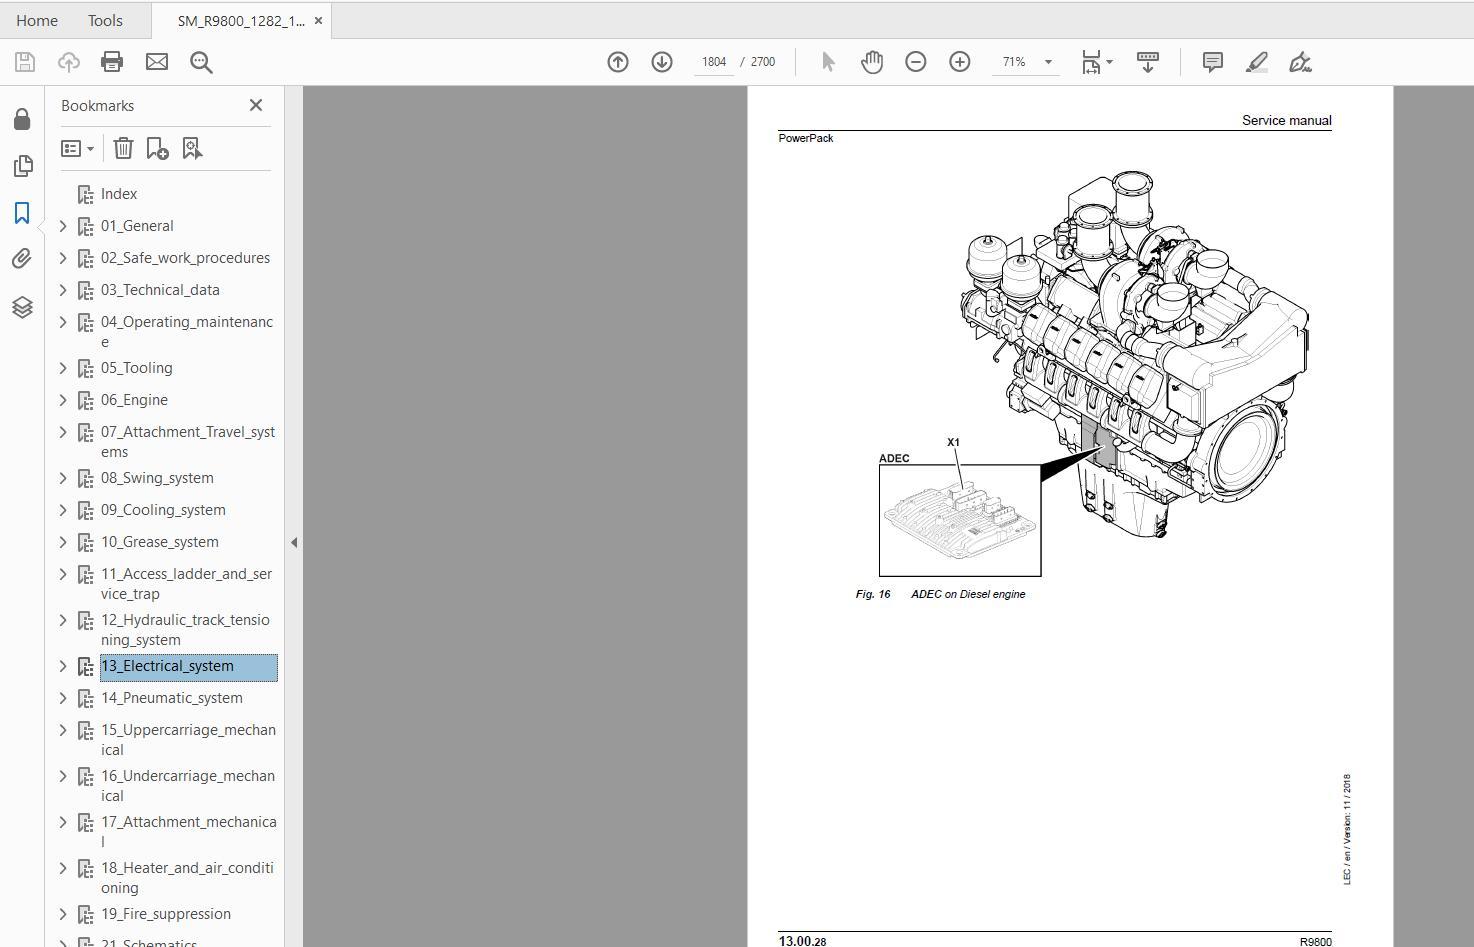 Liebherr_Mining_Excavators_Service_Manual_New_Updated_032020_10